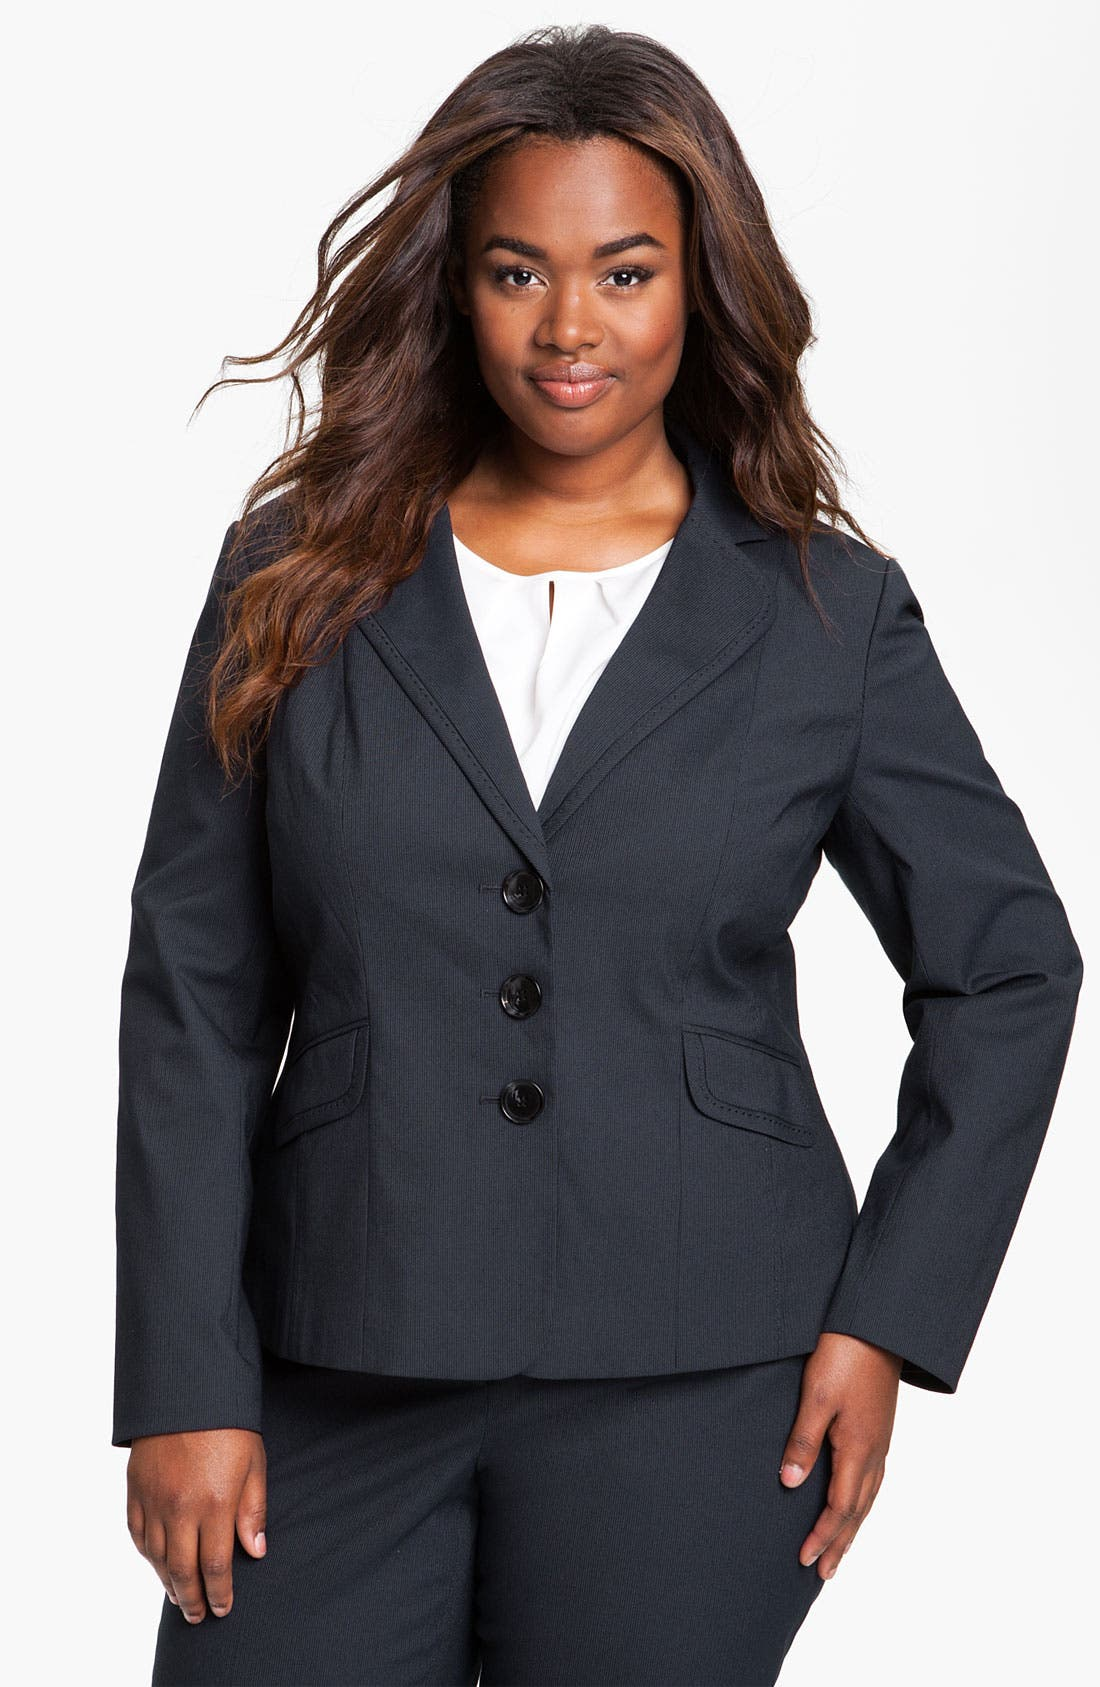 Alternate Image 1 Selected - Sejour Pinstripe Suit Jacket (Plus)